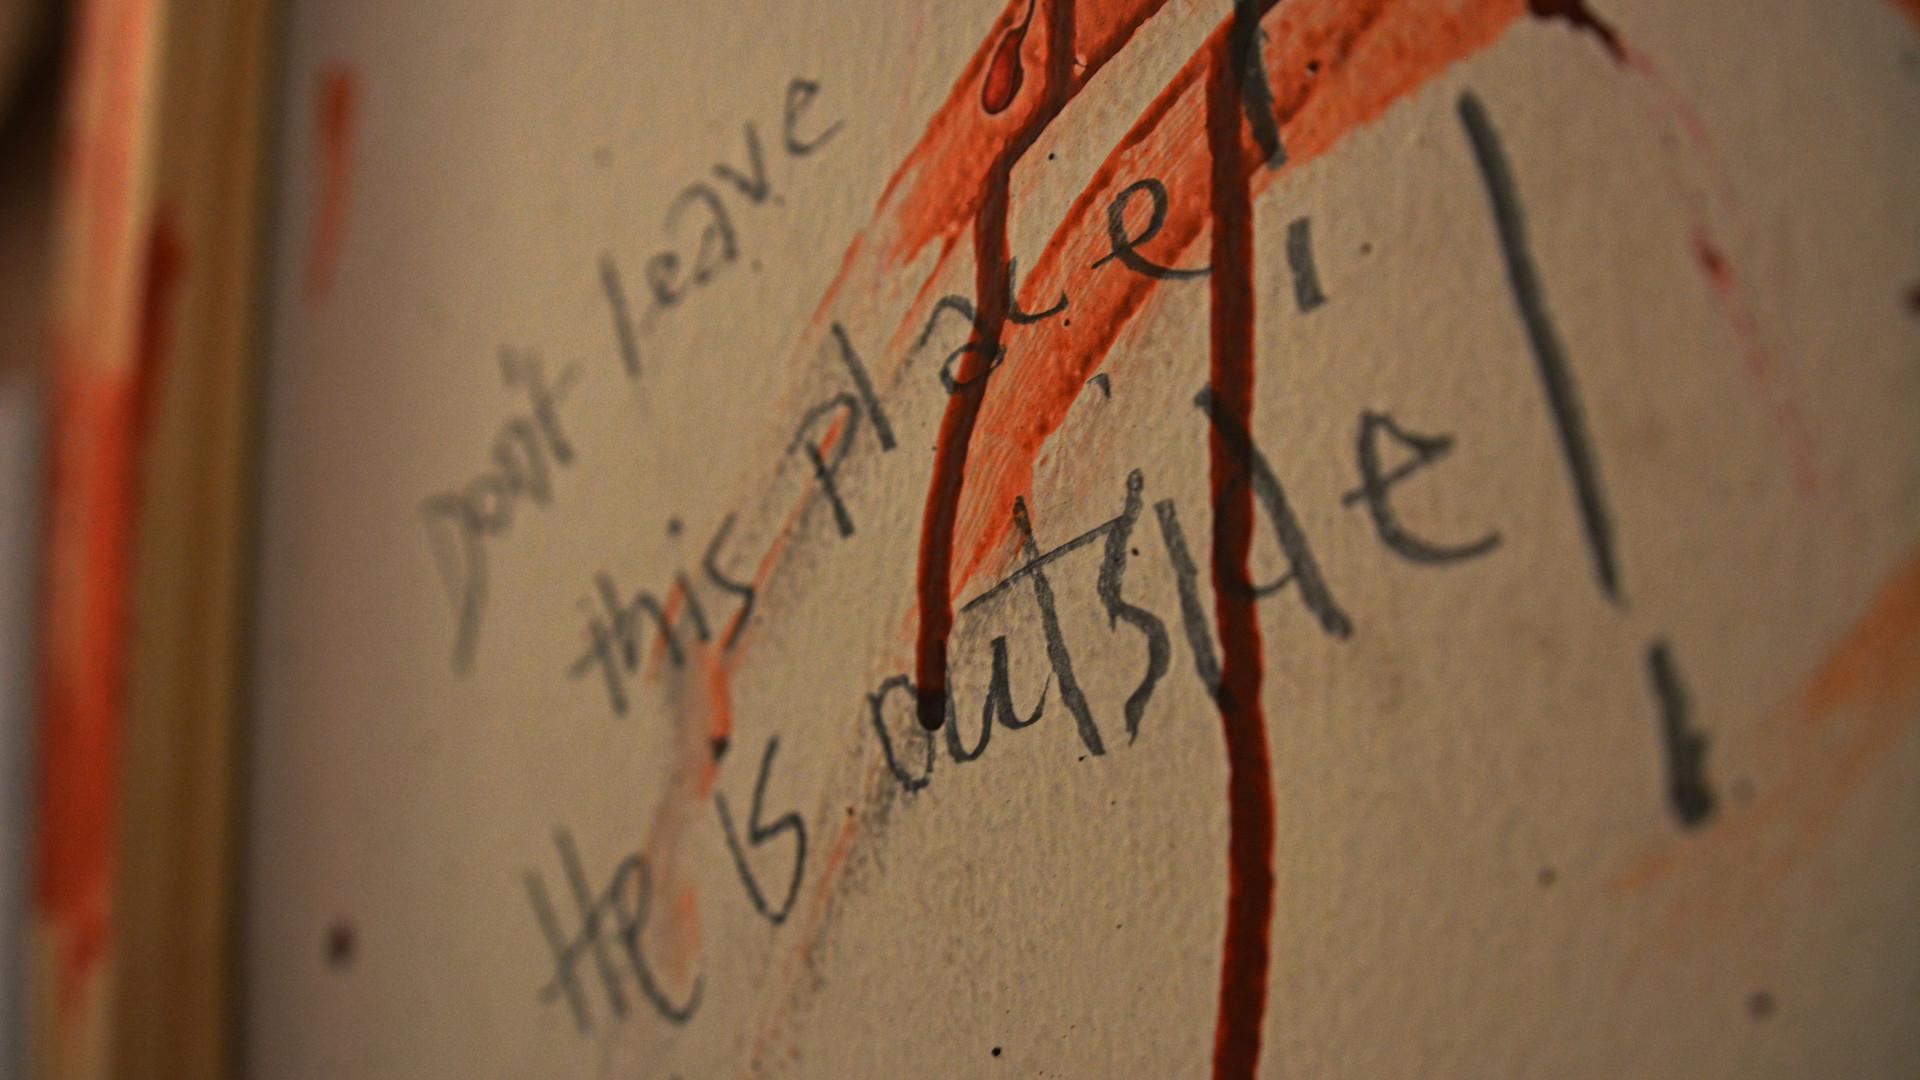 Bloody-Wall-Writing.jpg